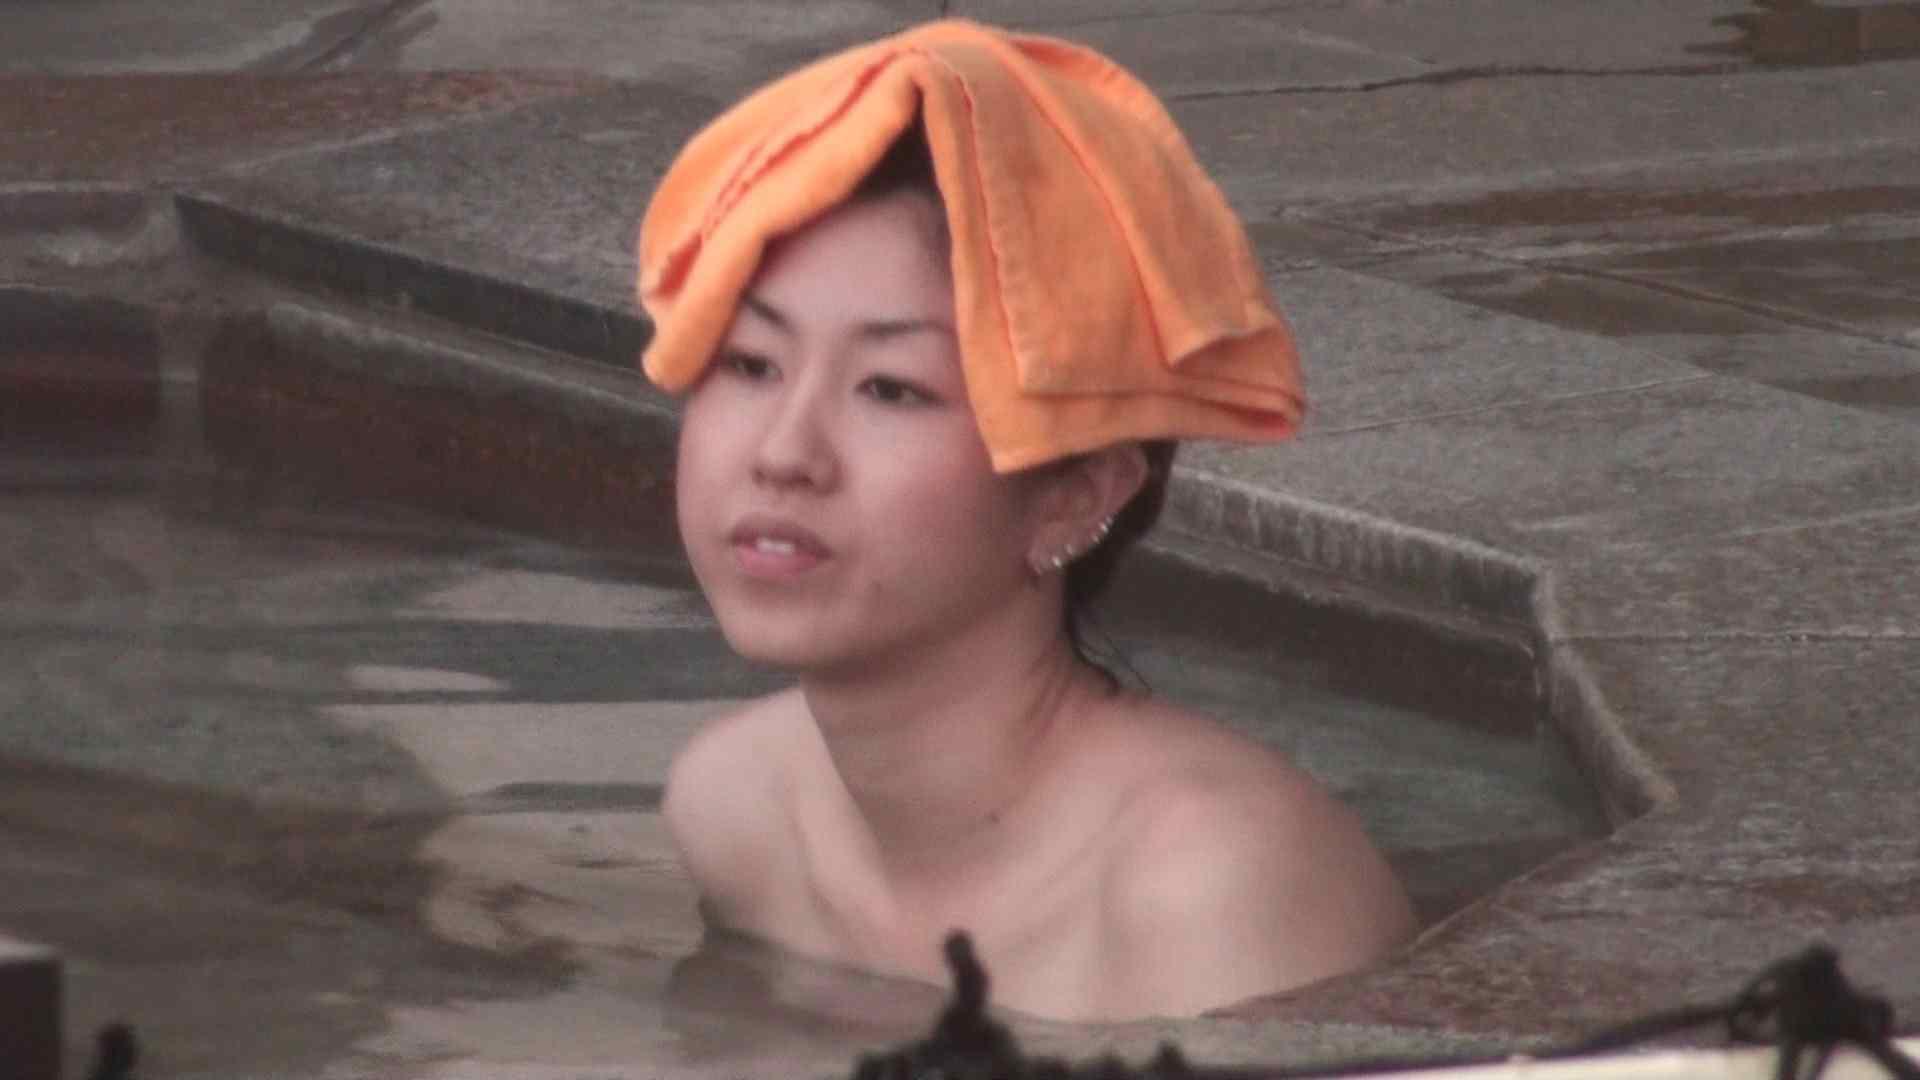 Aquaな露天風呂Vol.135 盗撮師作品 | 露天風呂突入  105pic 43